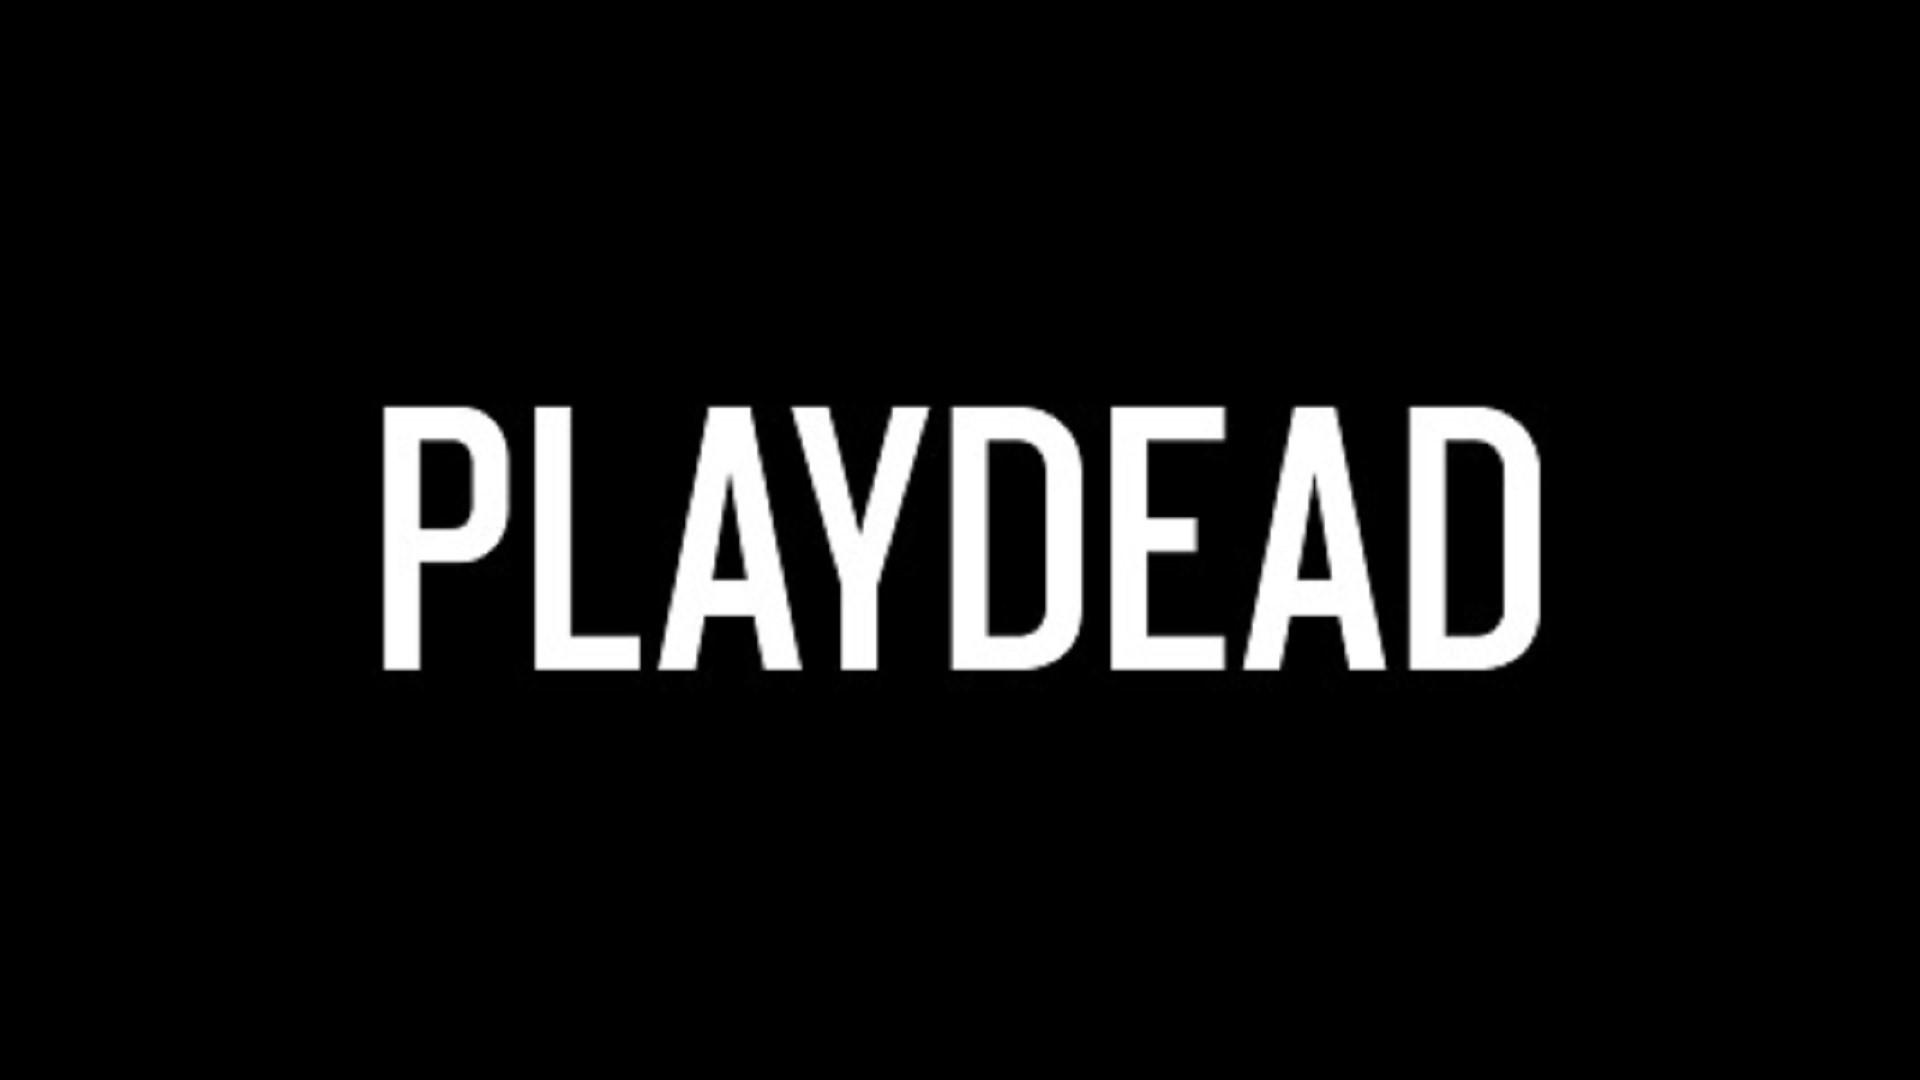 playdead logo